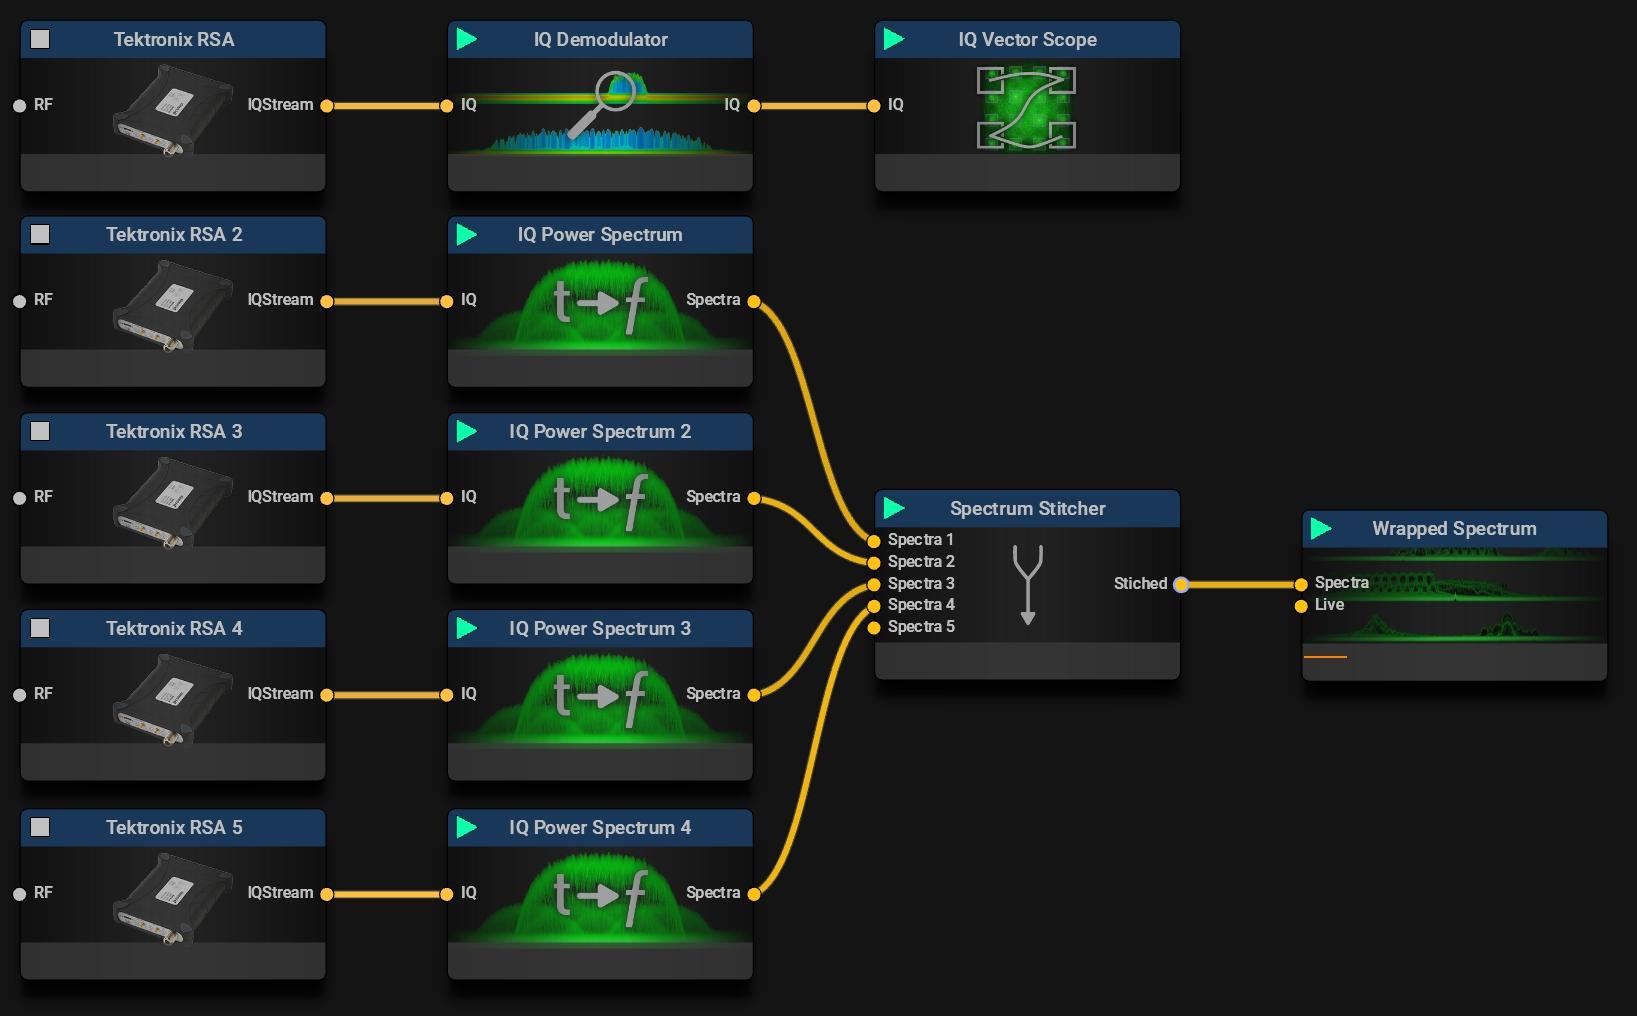 Tektronix RSA | Typical Mission Examples